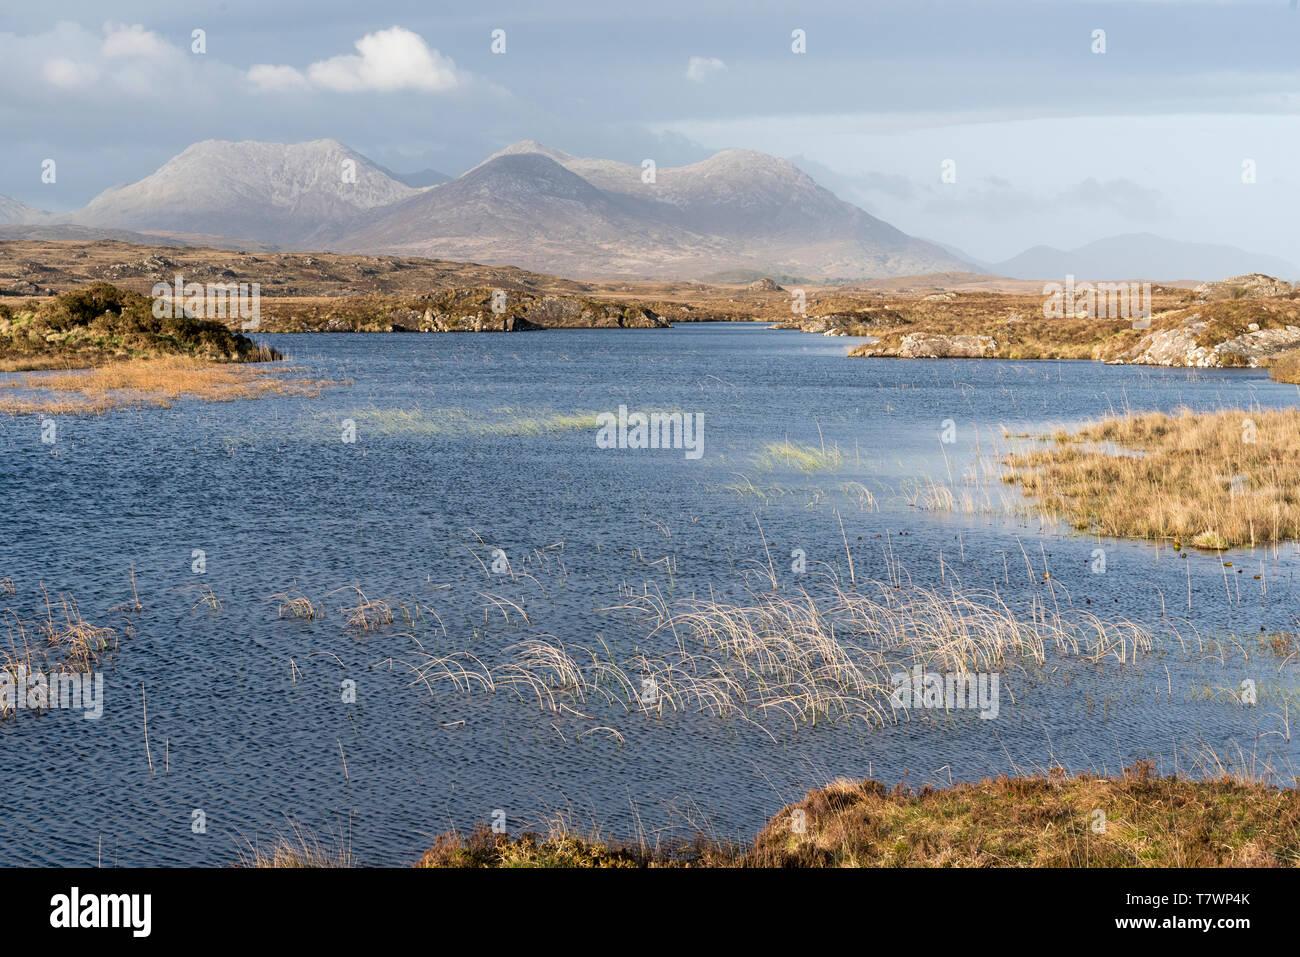 Ireland, County Galway, Connemara, lough, Twelve Bens mountains in the background - Stock Image